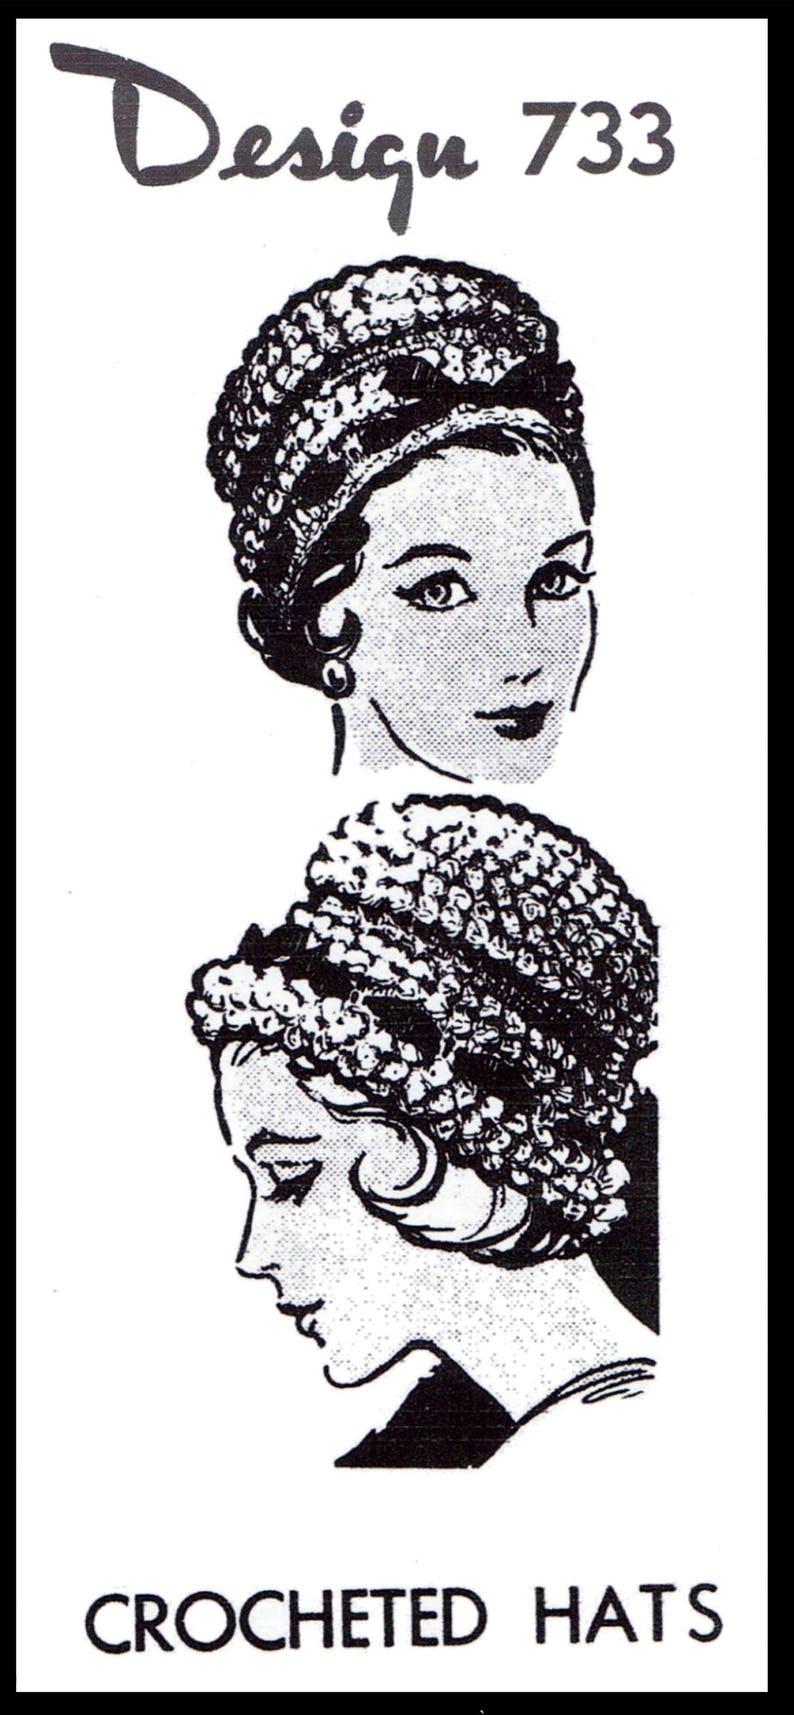 PDF Digital Delivery Millinery Crochet Crocheted Crocheting Pattern Design 733 CLOCHE Hat Cap Fascinator Chemo Cancer Alopecia P.D.F File